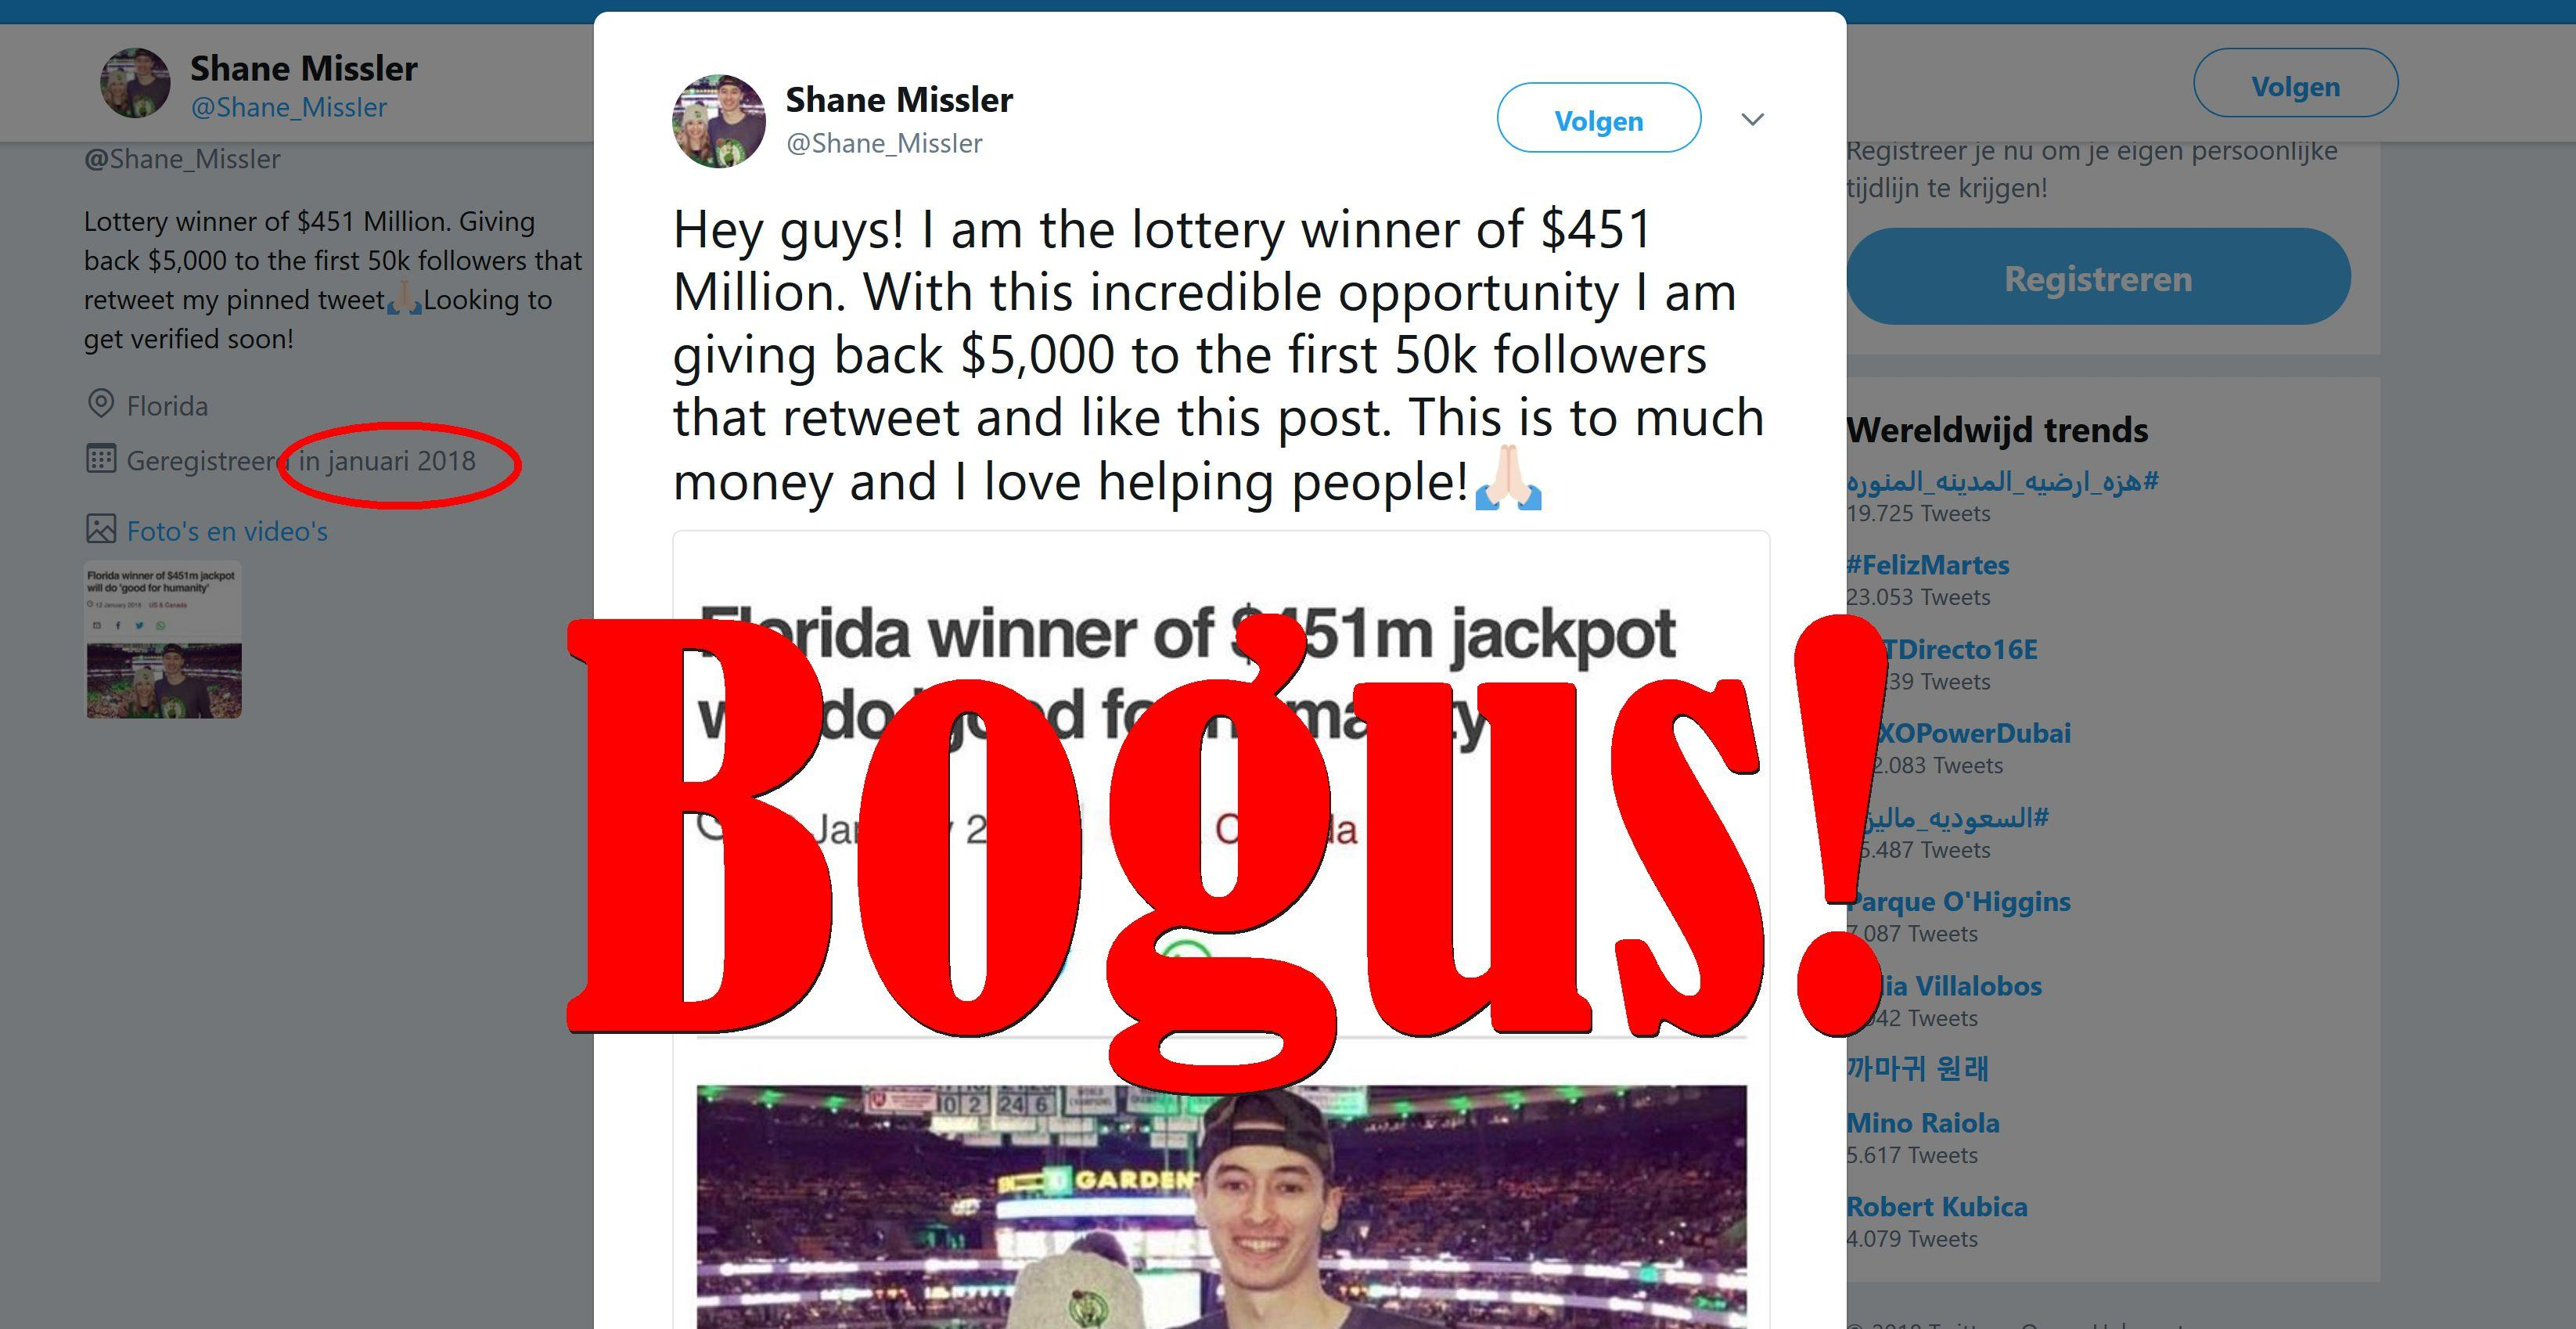 Fake News: $451 Million Lottery Winner Shane Missler NOT Giving Away $5,000 To Retweeters